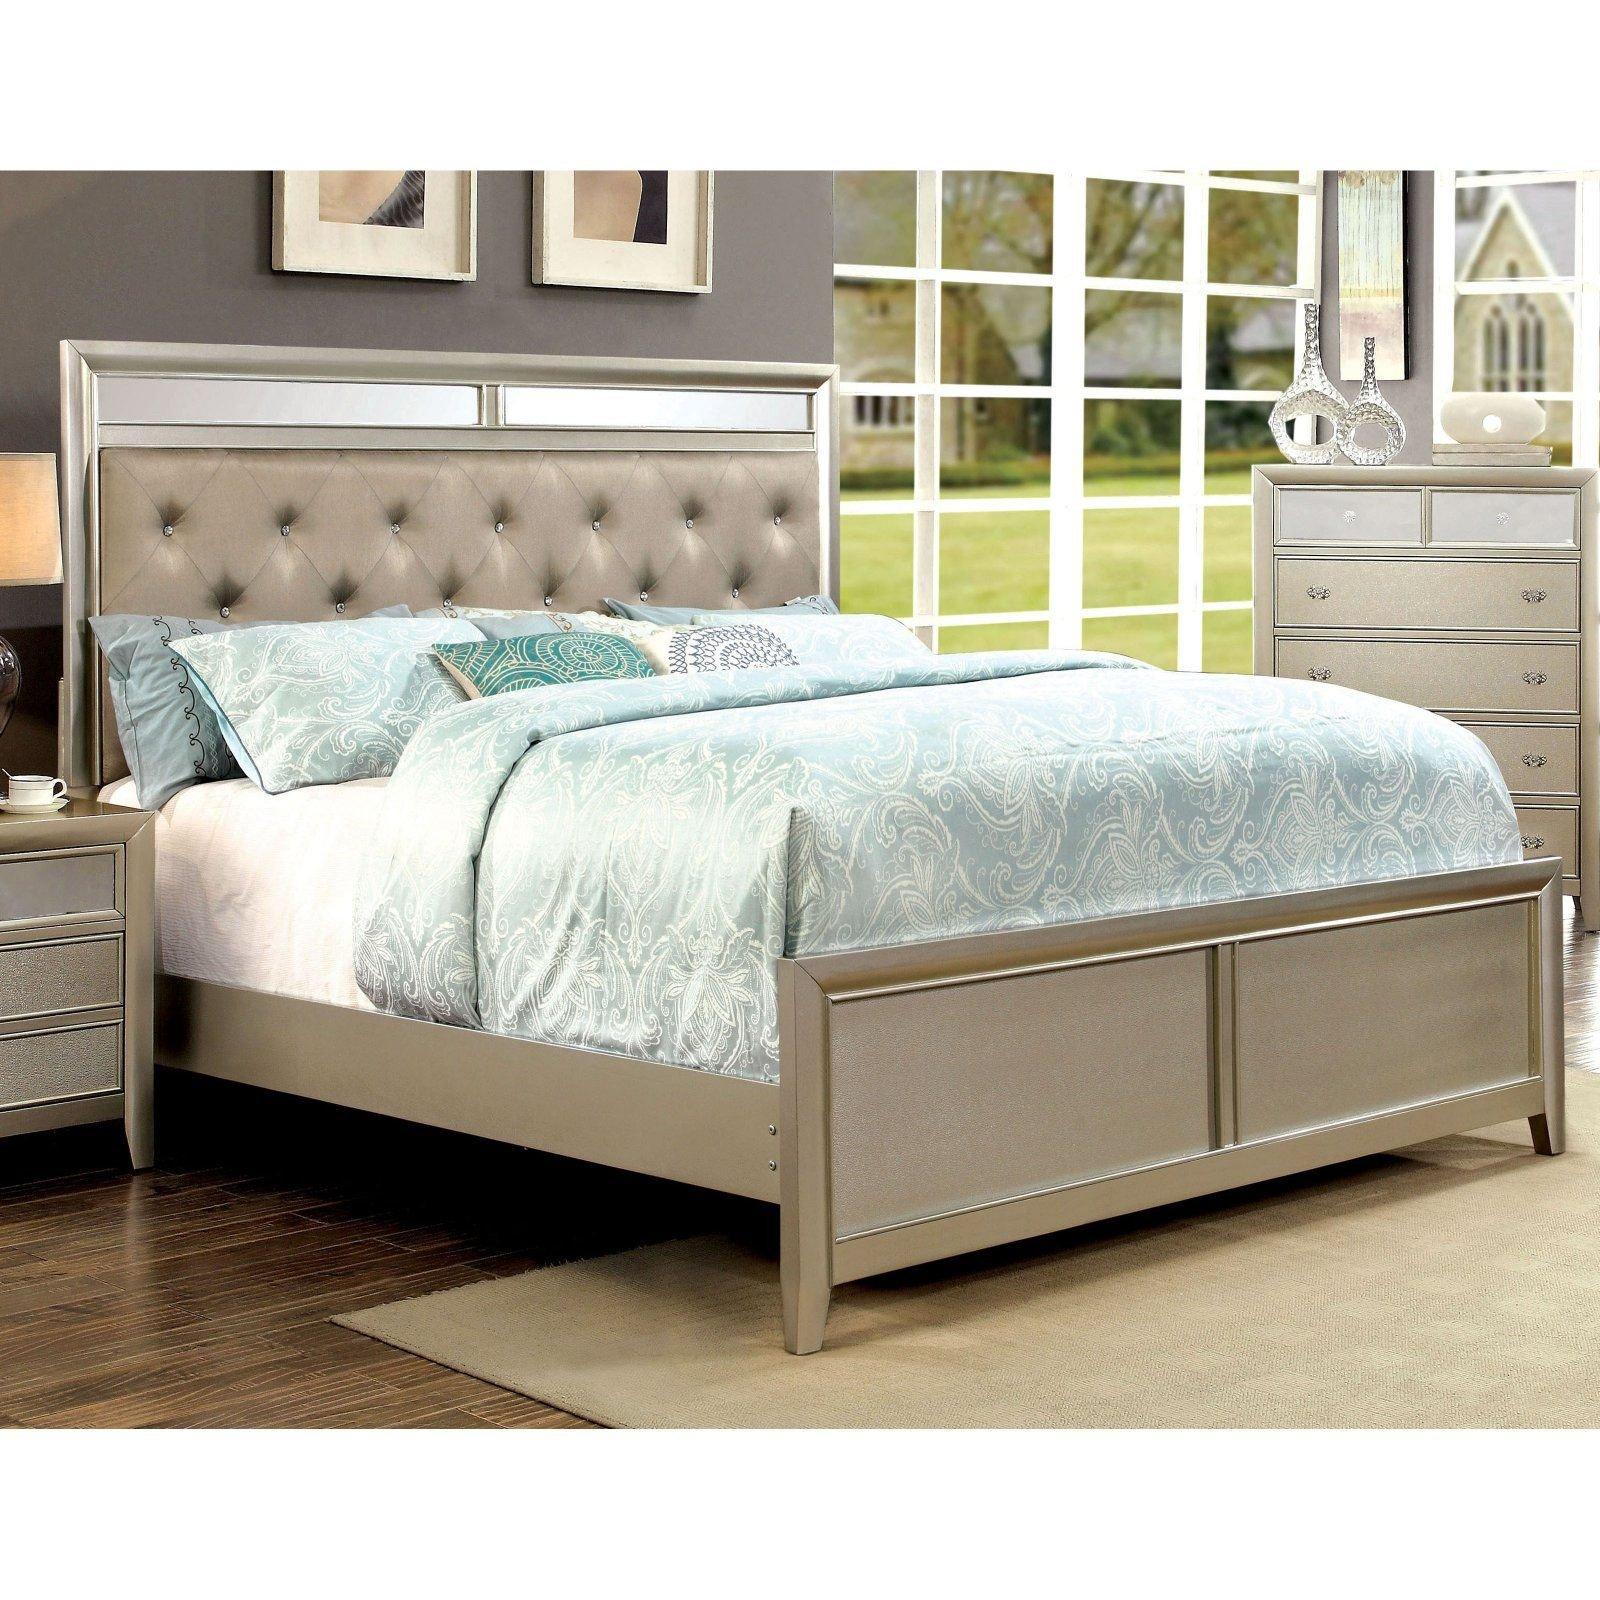 Bedroom Set California King Lovely Furniture Of America Glendora Upholstered Panel Bed Size